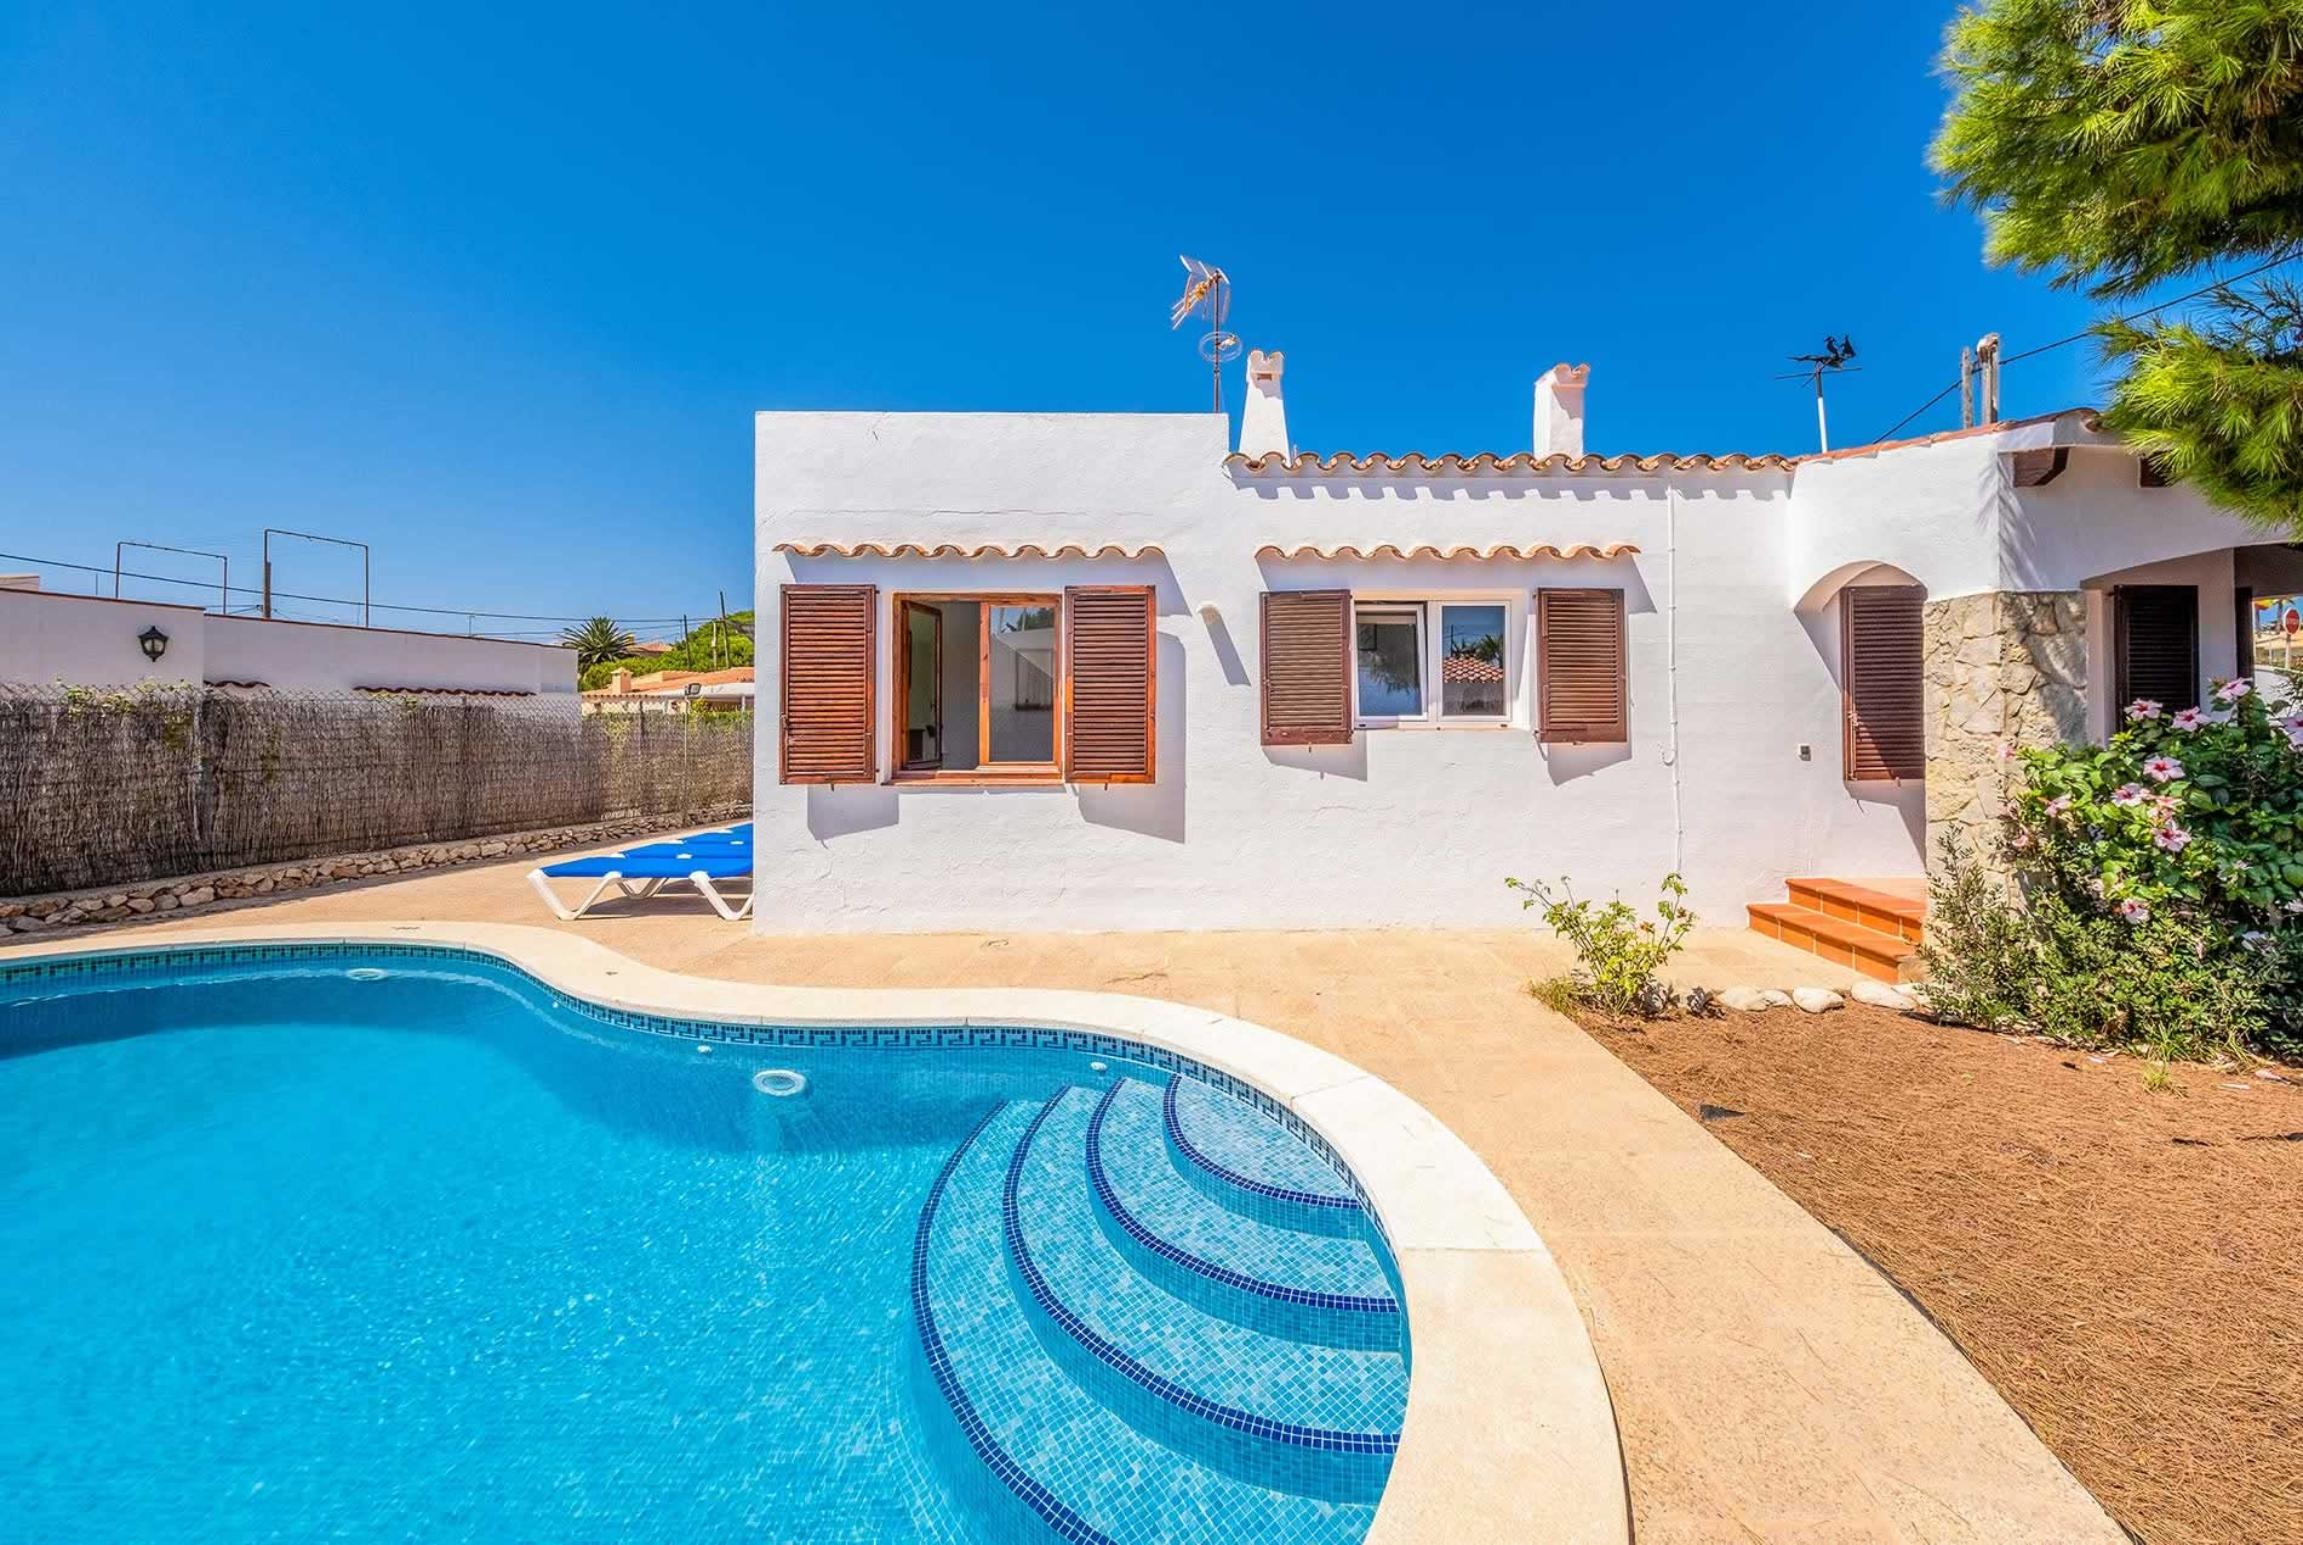 Ferienhaus Iris Prima (2653680), Punta Prima, Menorca, Balearische Inseln, Spanien, Bild 5